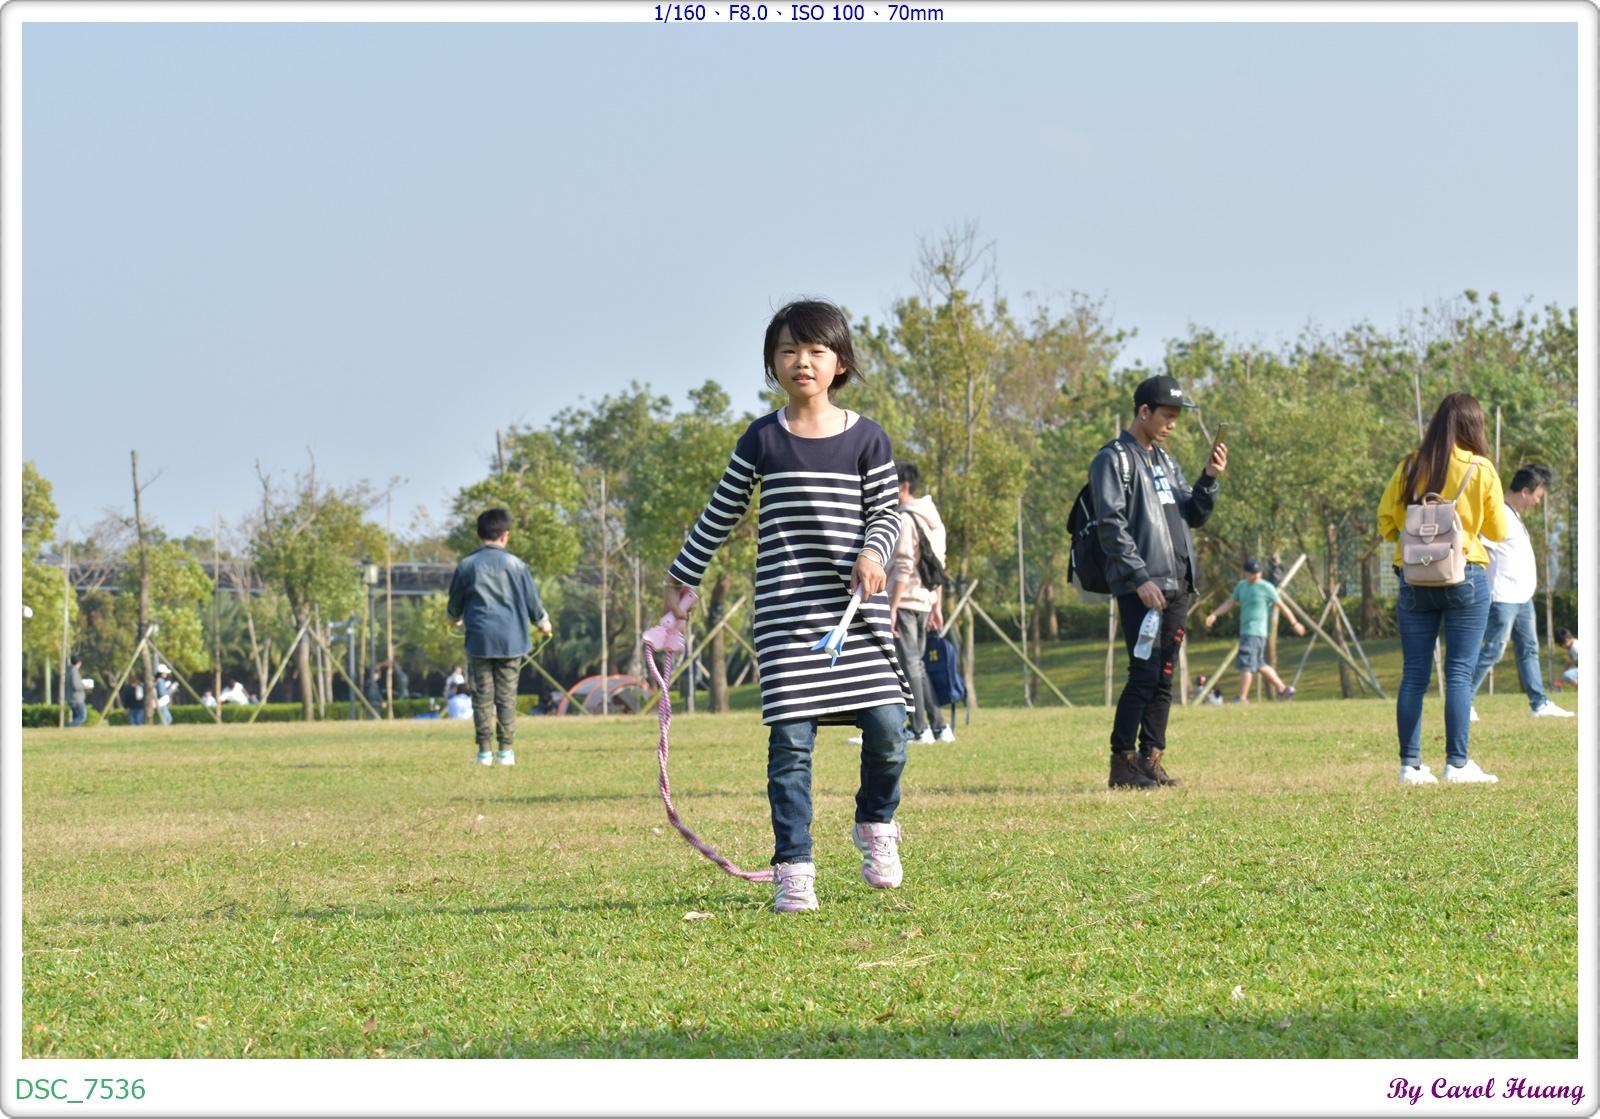 DSC_7536.JPG